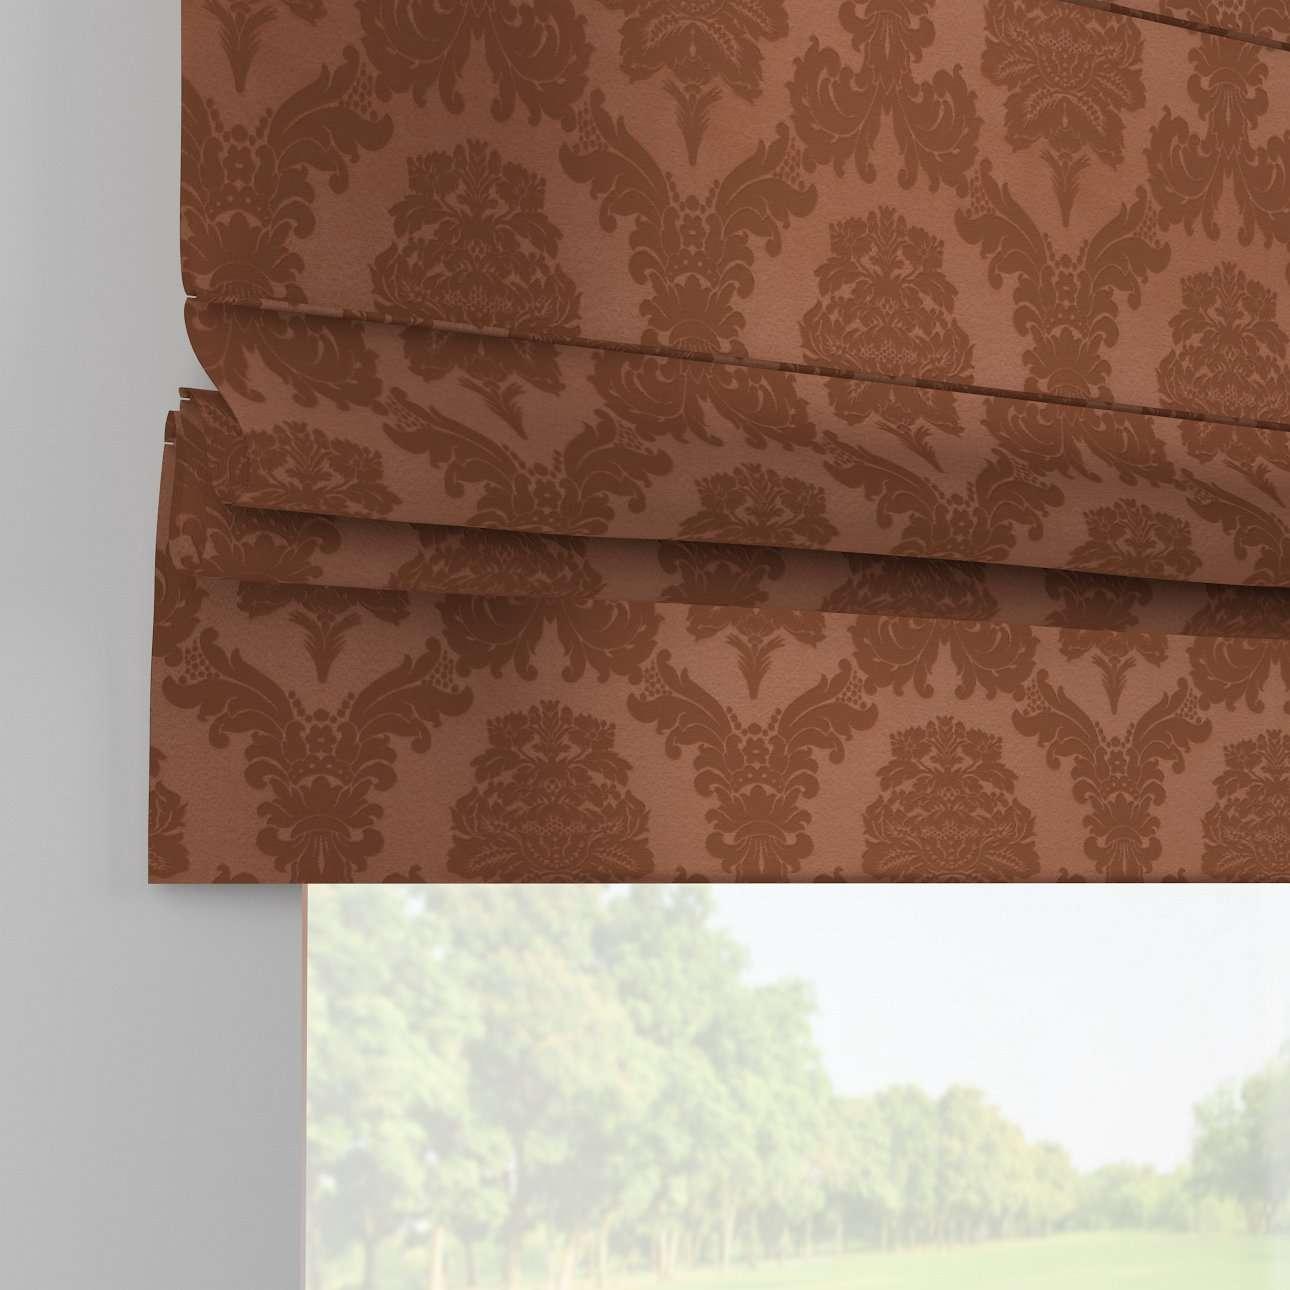 Rímska roleta Padva 80 x 170 cm V kolekcii Damasco, tkanina: 613-88